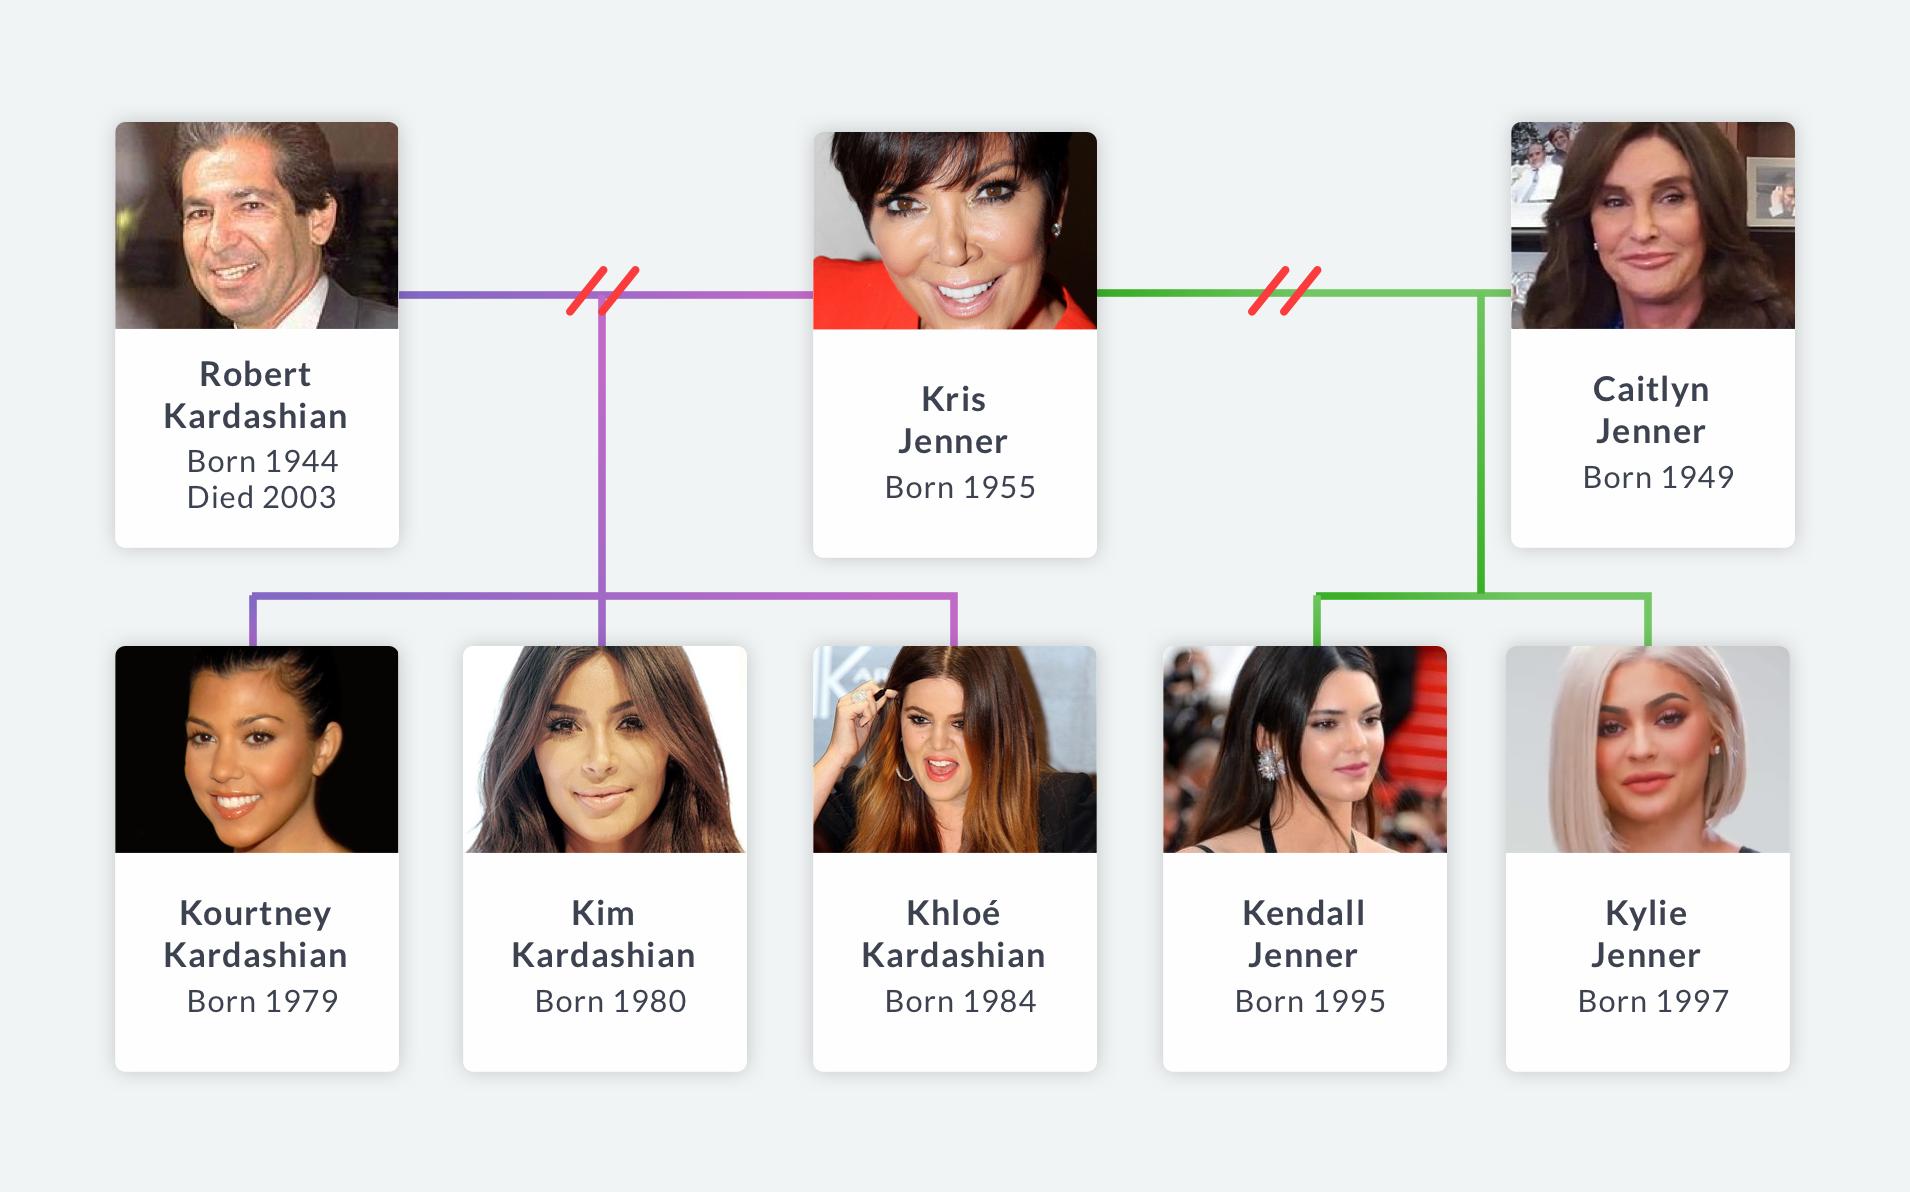 Kardashian Jenner sisters family tree